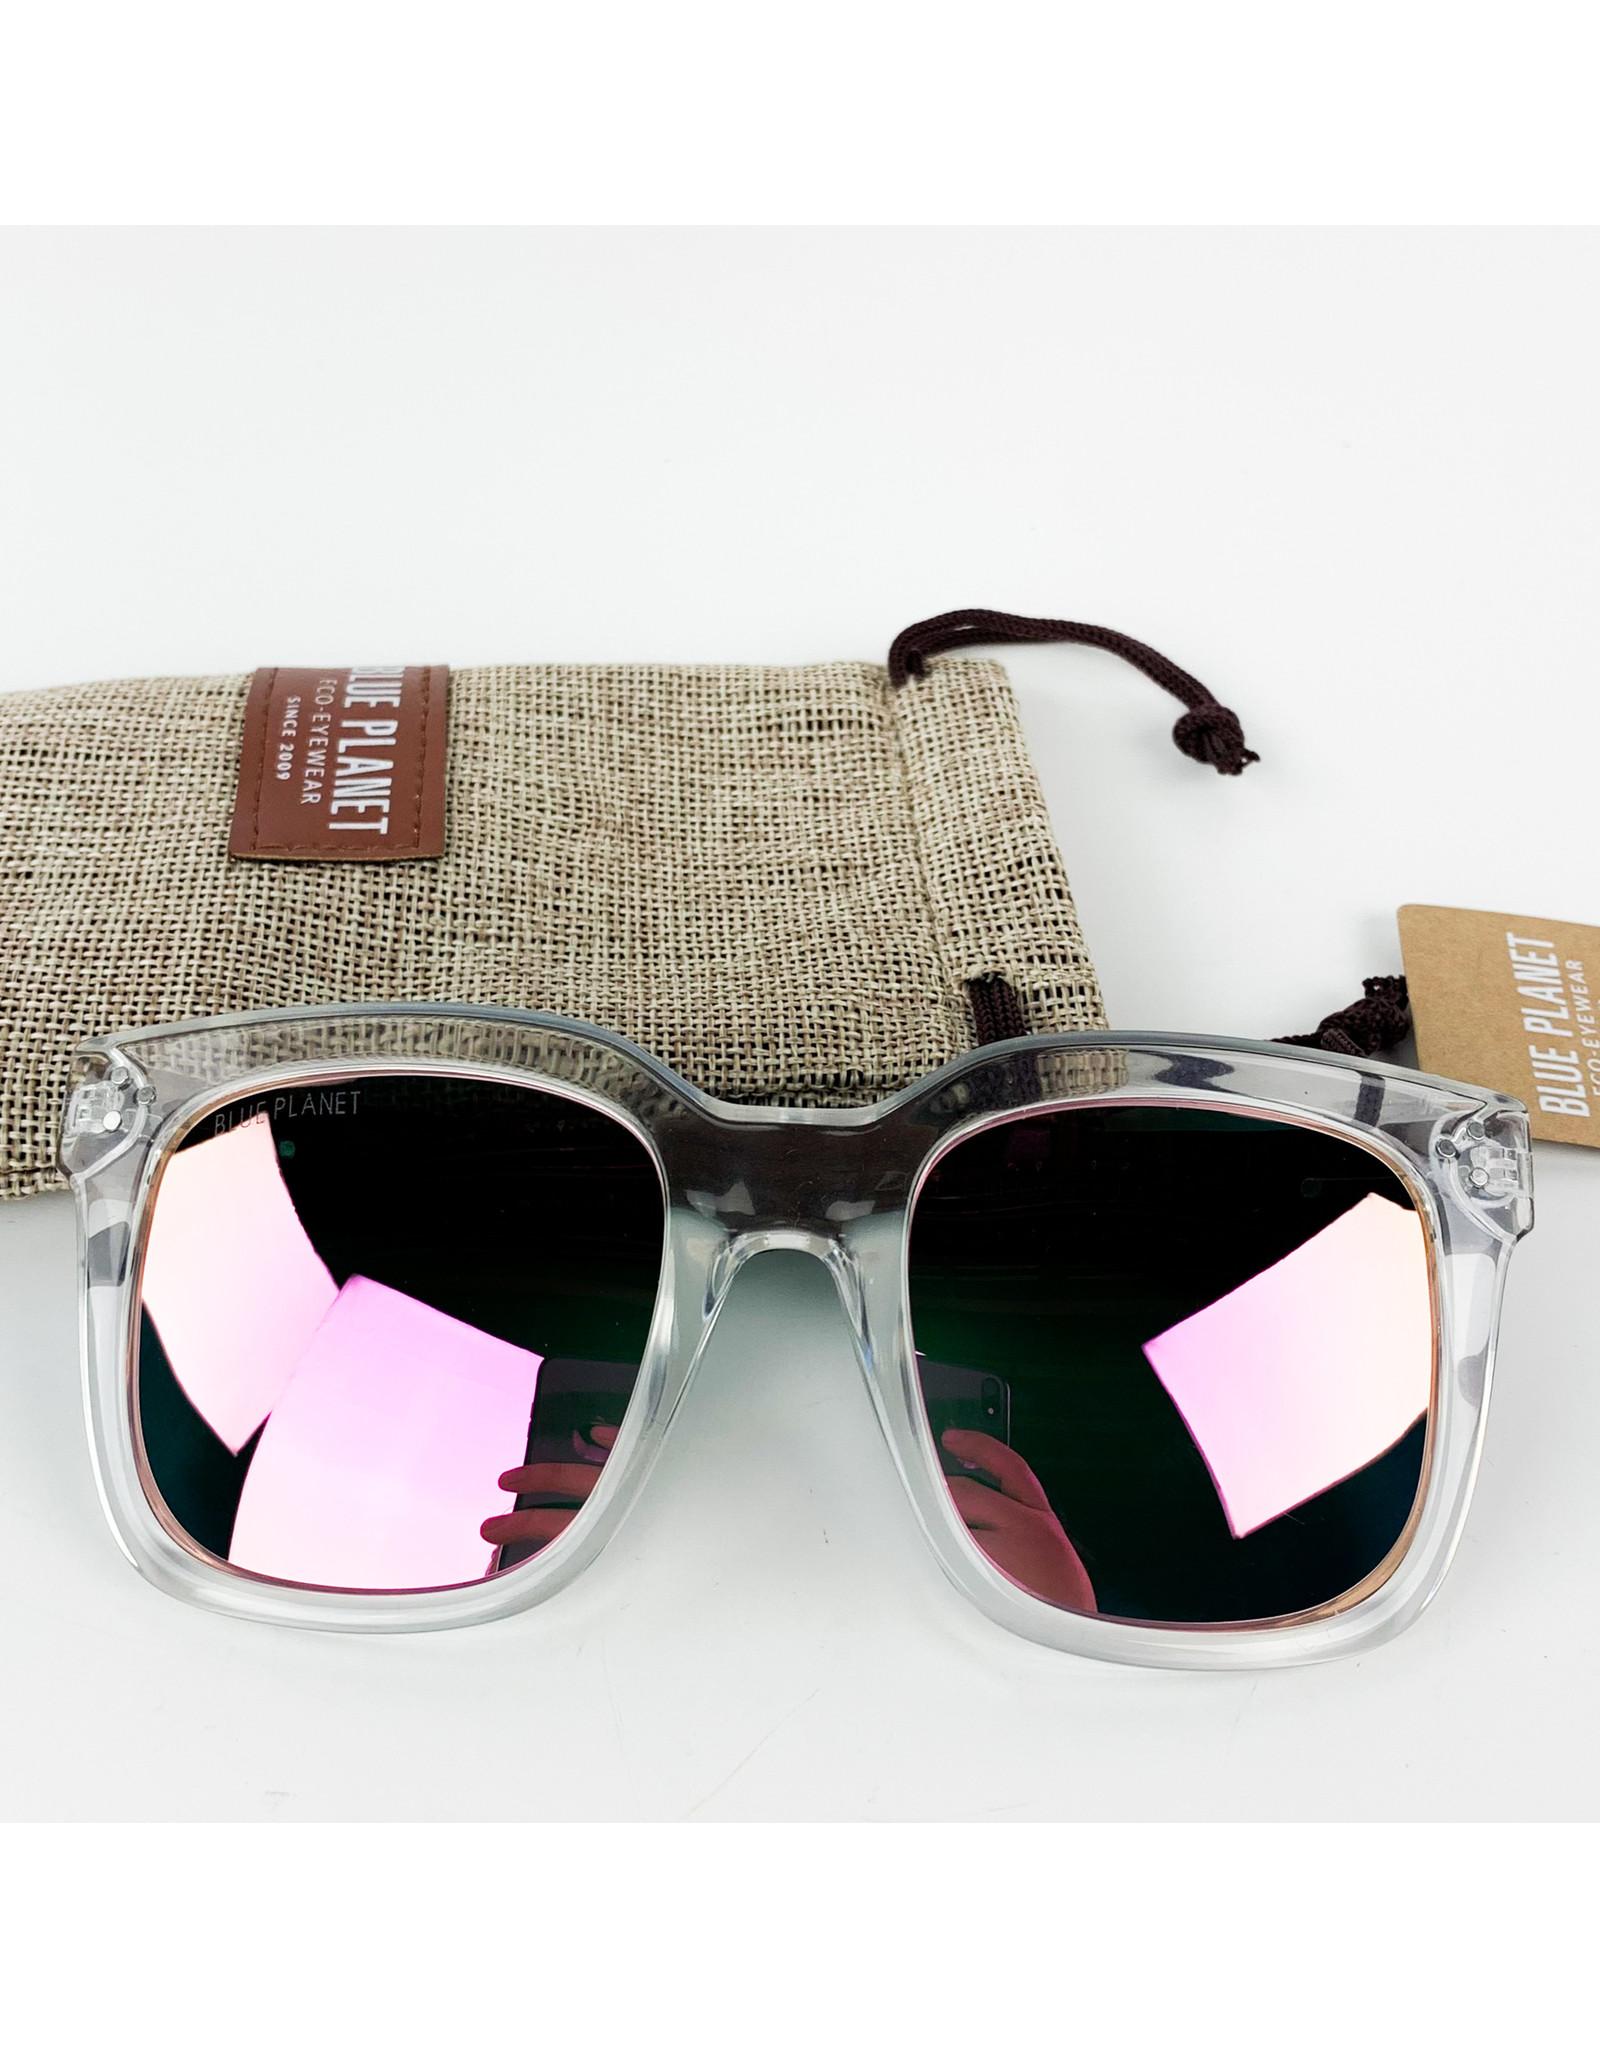 Blue Planet Sunglasses Adalee